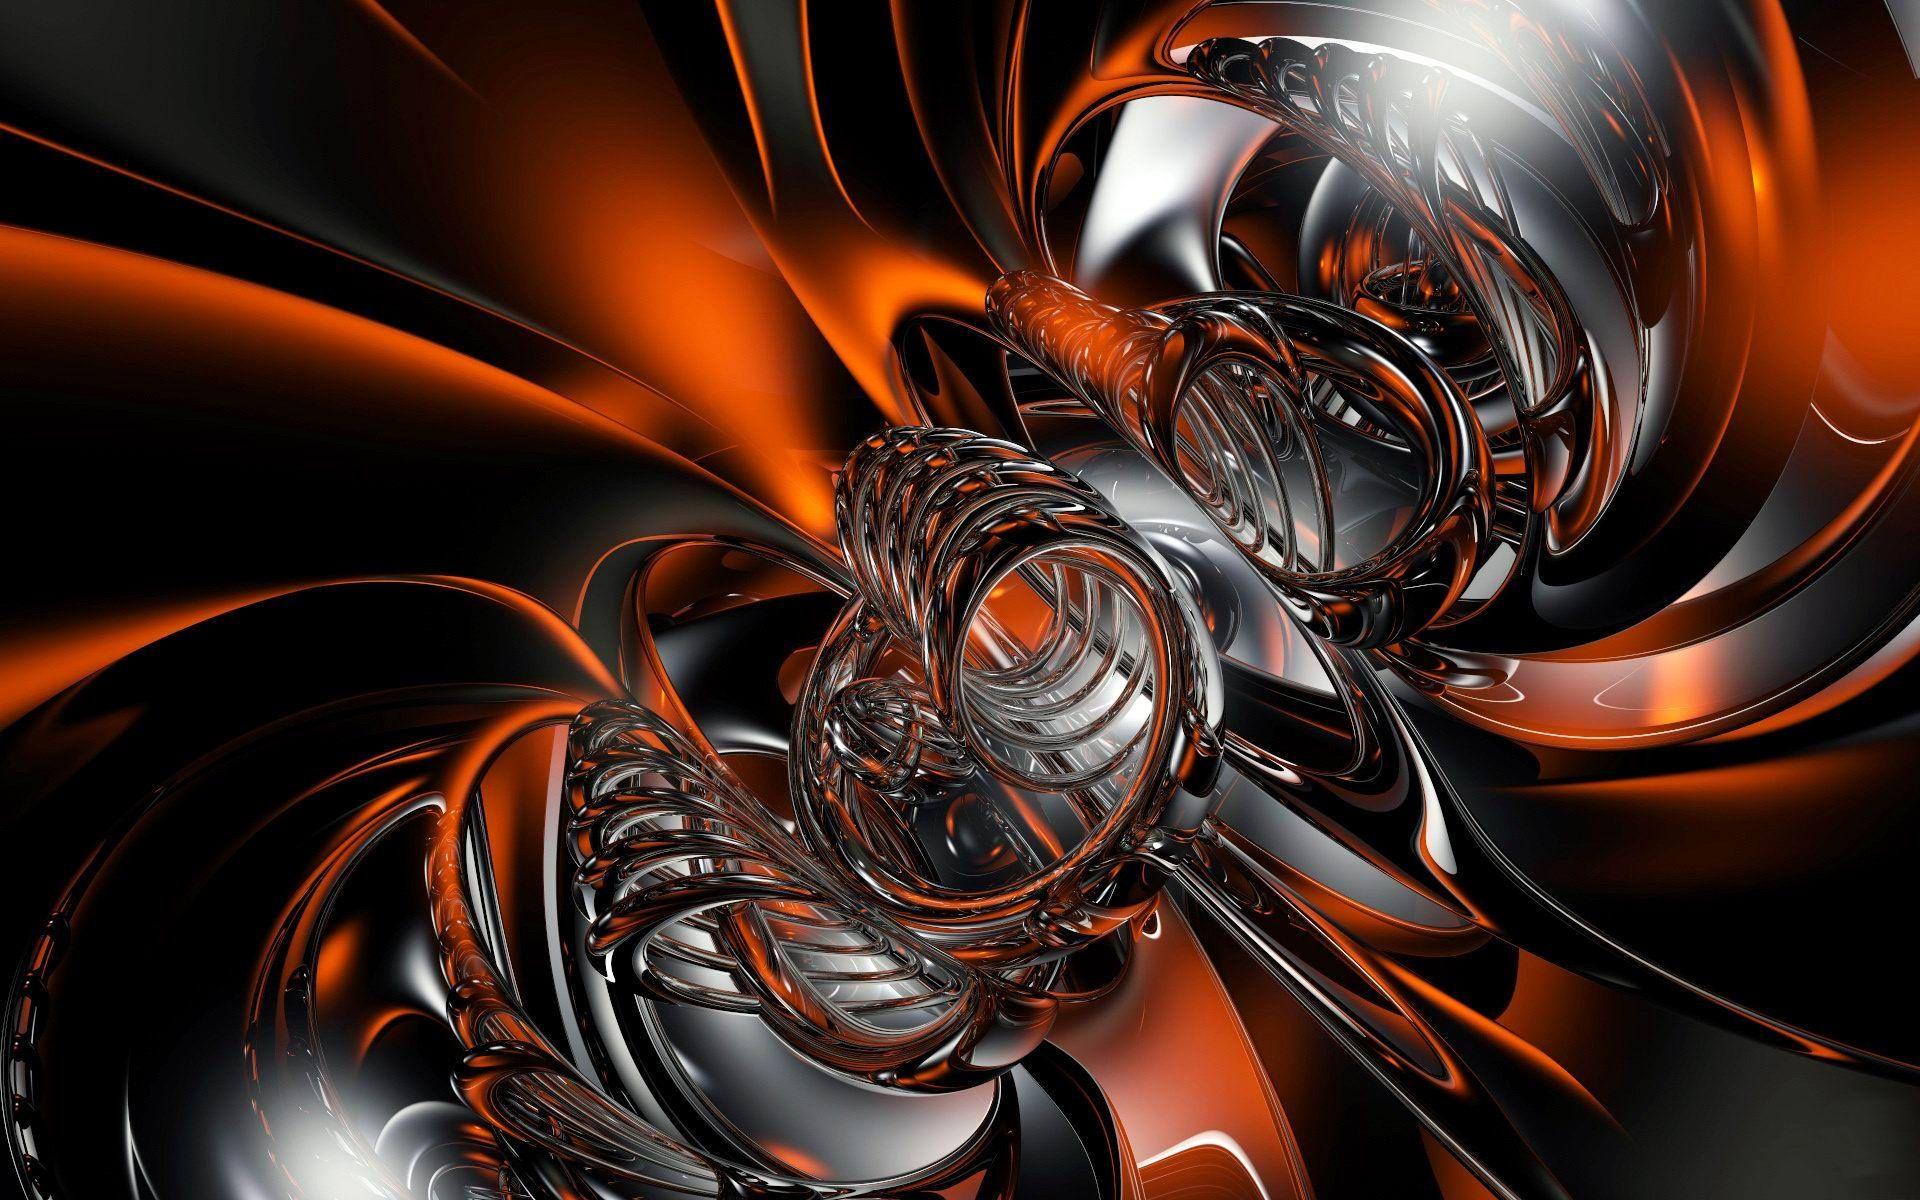 D cool wallpapers wallpaper 1366768 cool wallpapers 3d 66 d cool wallpapers wallpaper 1366768 cool wallpapers 3d 66 wallpapers adorable voltagebd Images